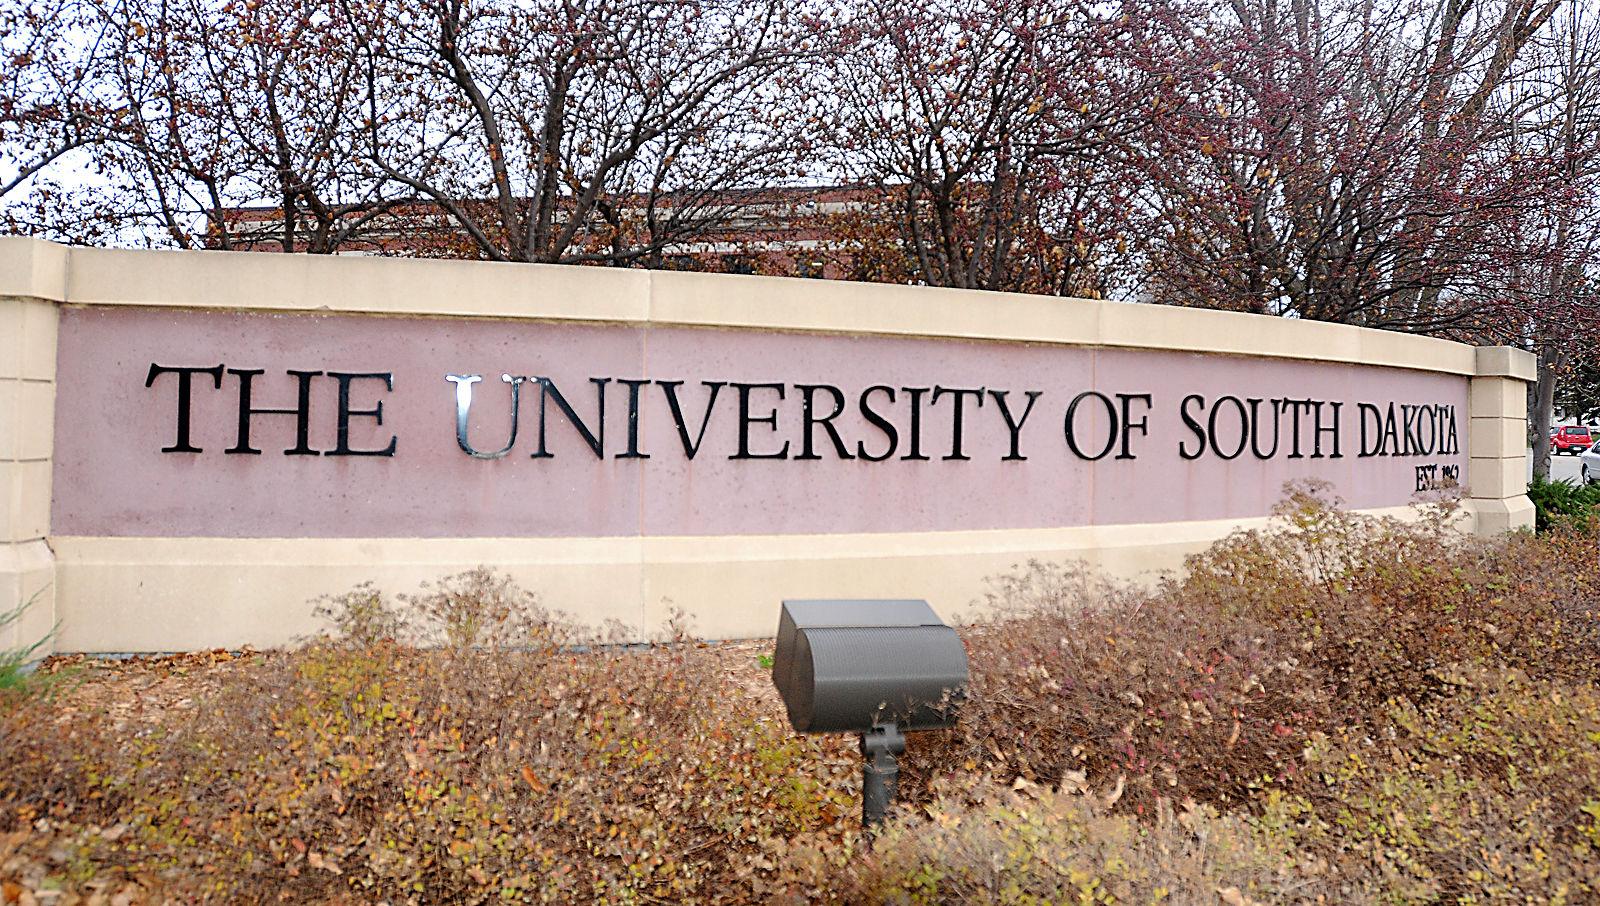 South Dakota Board of Regents - Home | Facebook